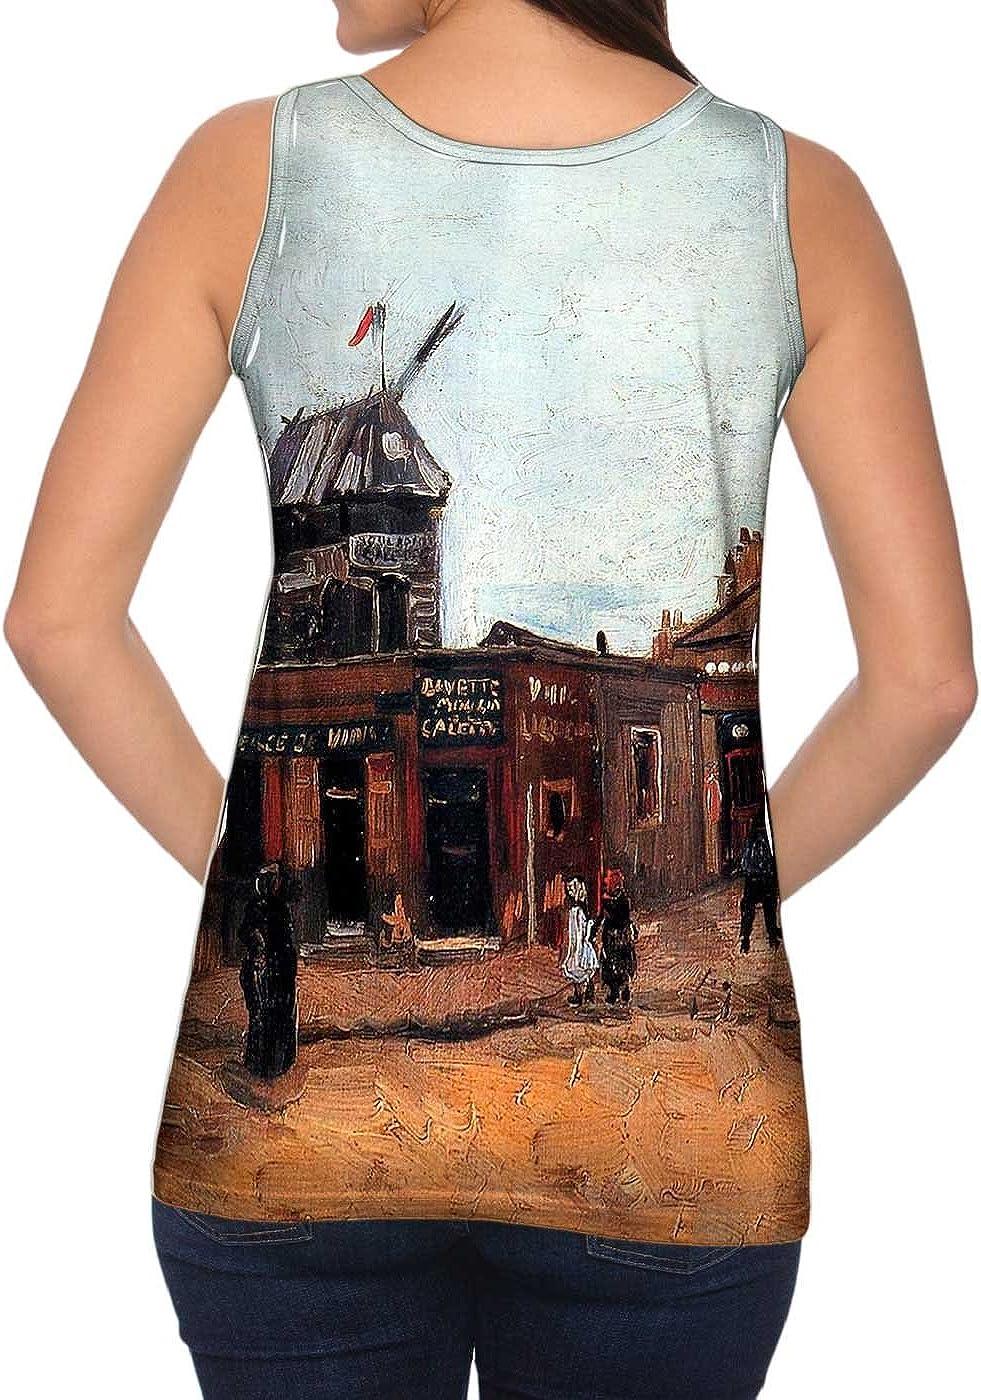 Womens Tank Top Van Gogh -Tshirt Yizzam Moulin de Galette 1886